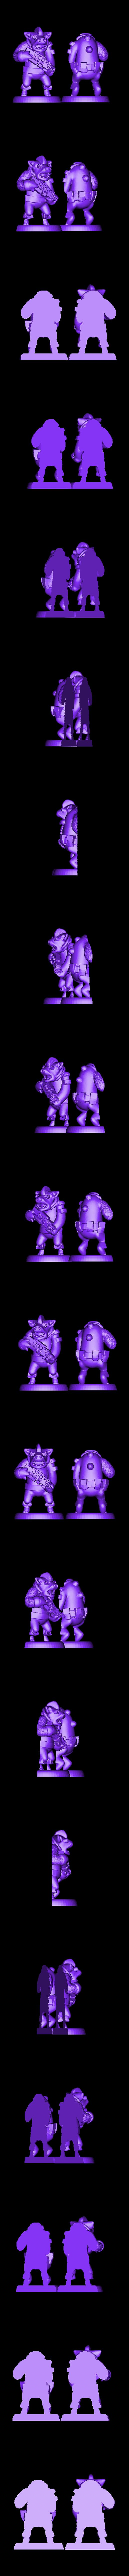 WarpigGruntSplit.stl Download free STL file Miniature - War Pig Grunt (18mm Scale) (2016) • Object to 3D print, whackolantern